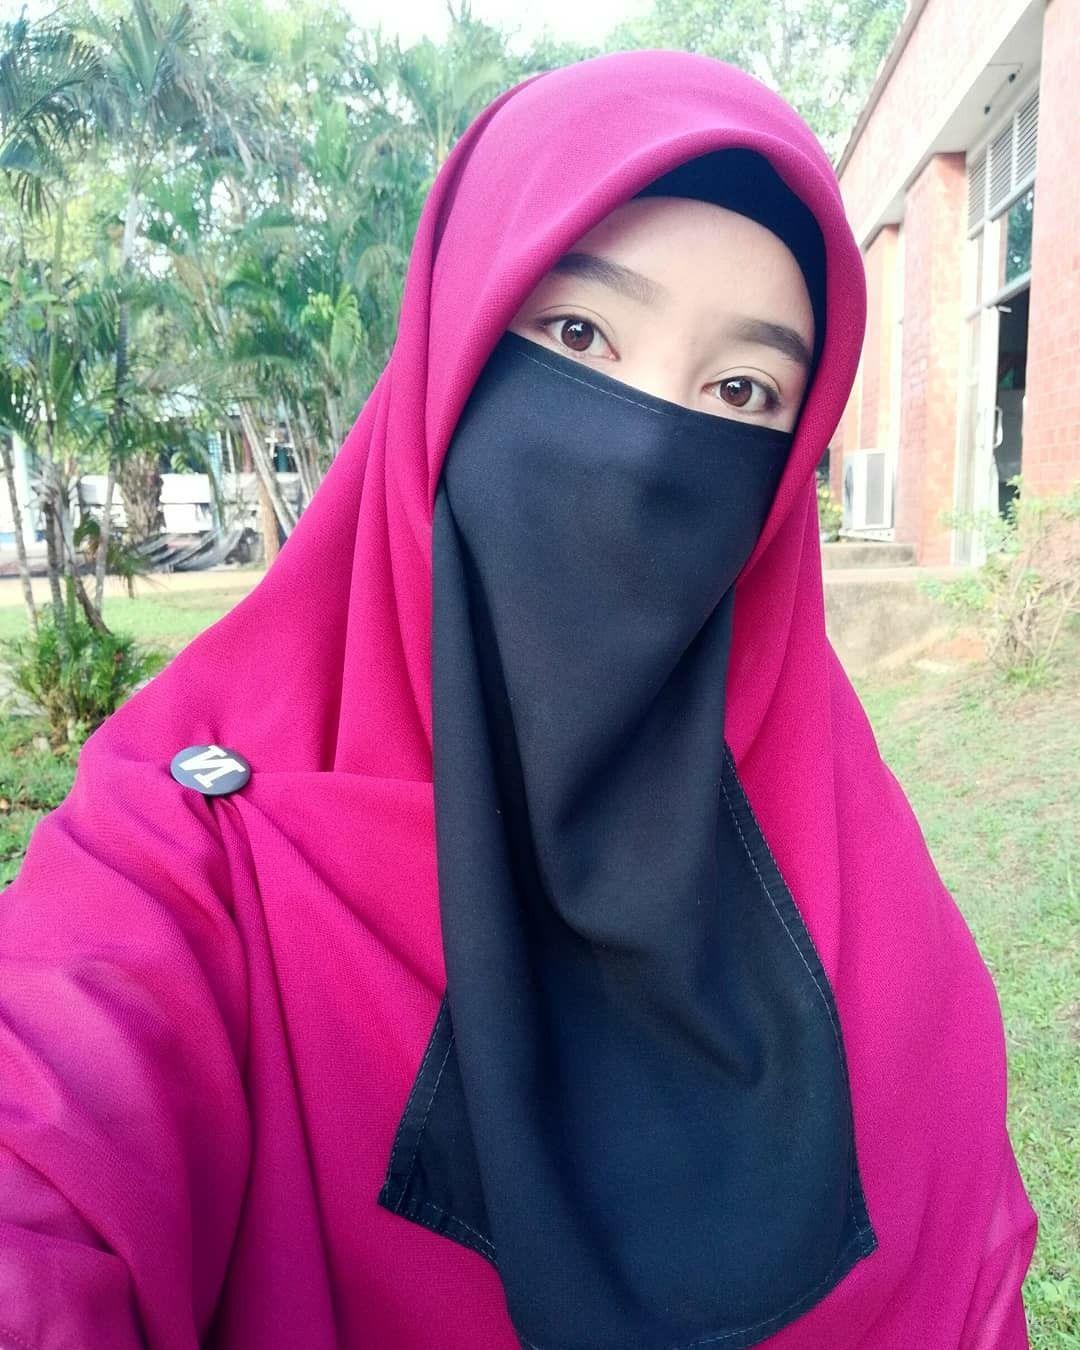 Pin oleh ari macellas di Niqab Wanita, Model pakaian